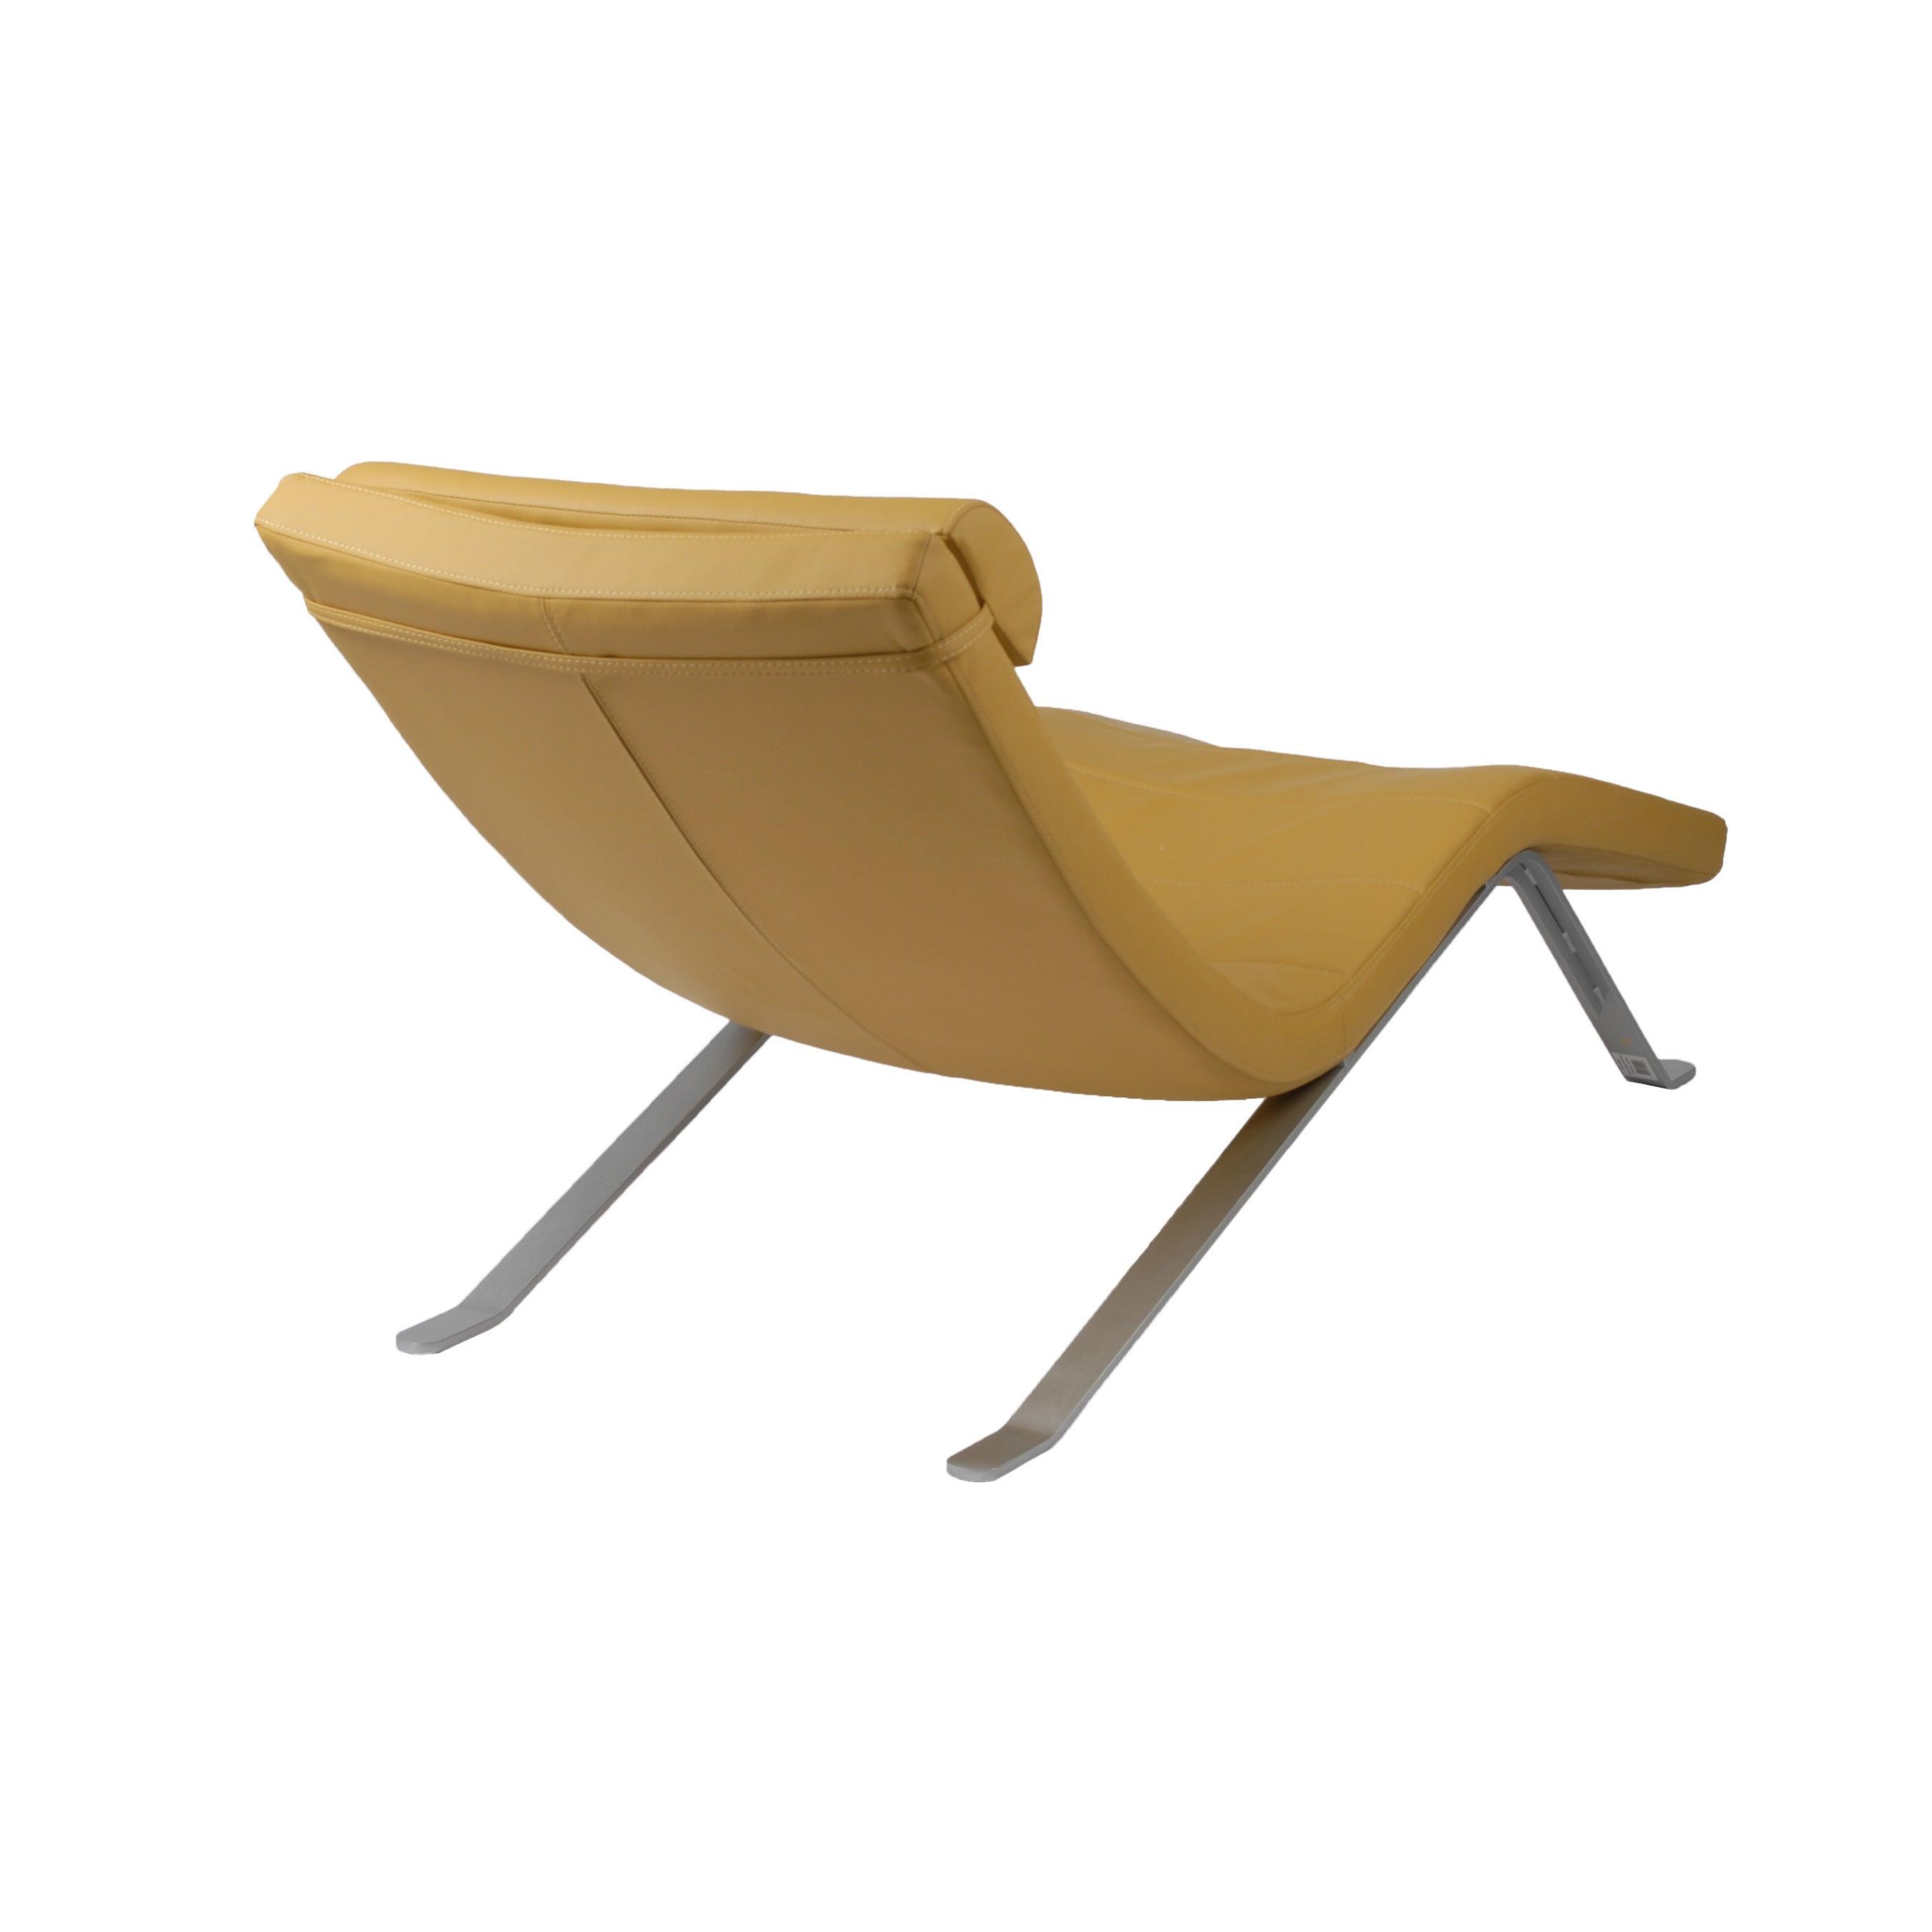 Merveilleux Shop Gilda Lounge Chair   Saffron/Silver   Free Shipping Today    Overstock.com   10756517